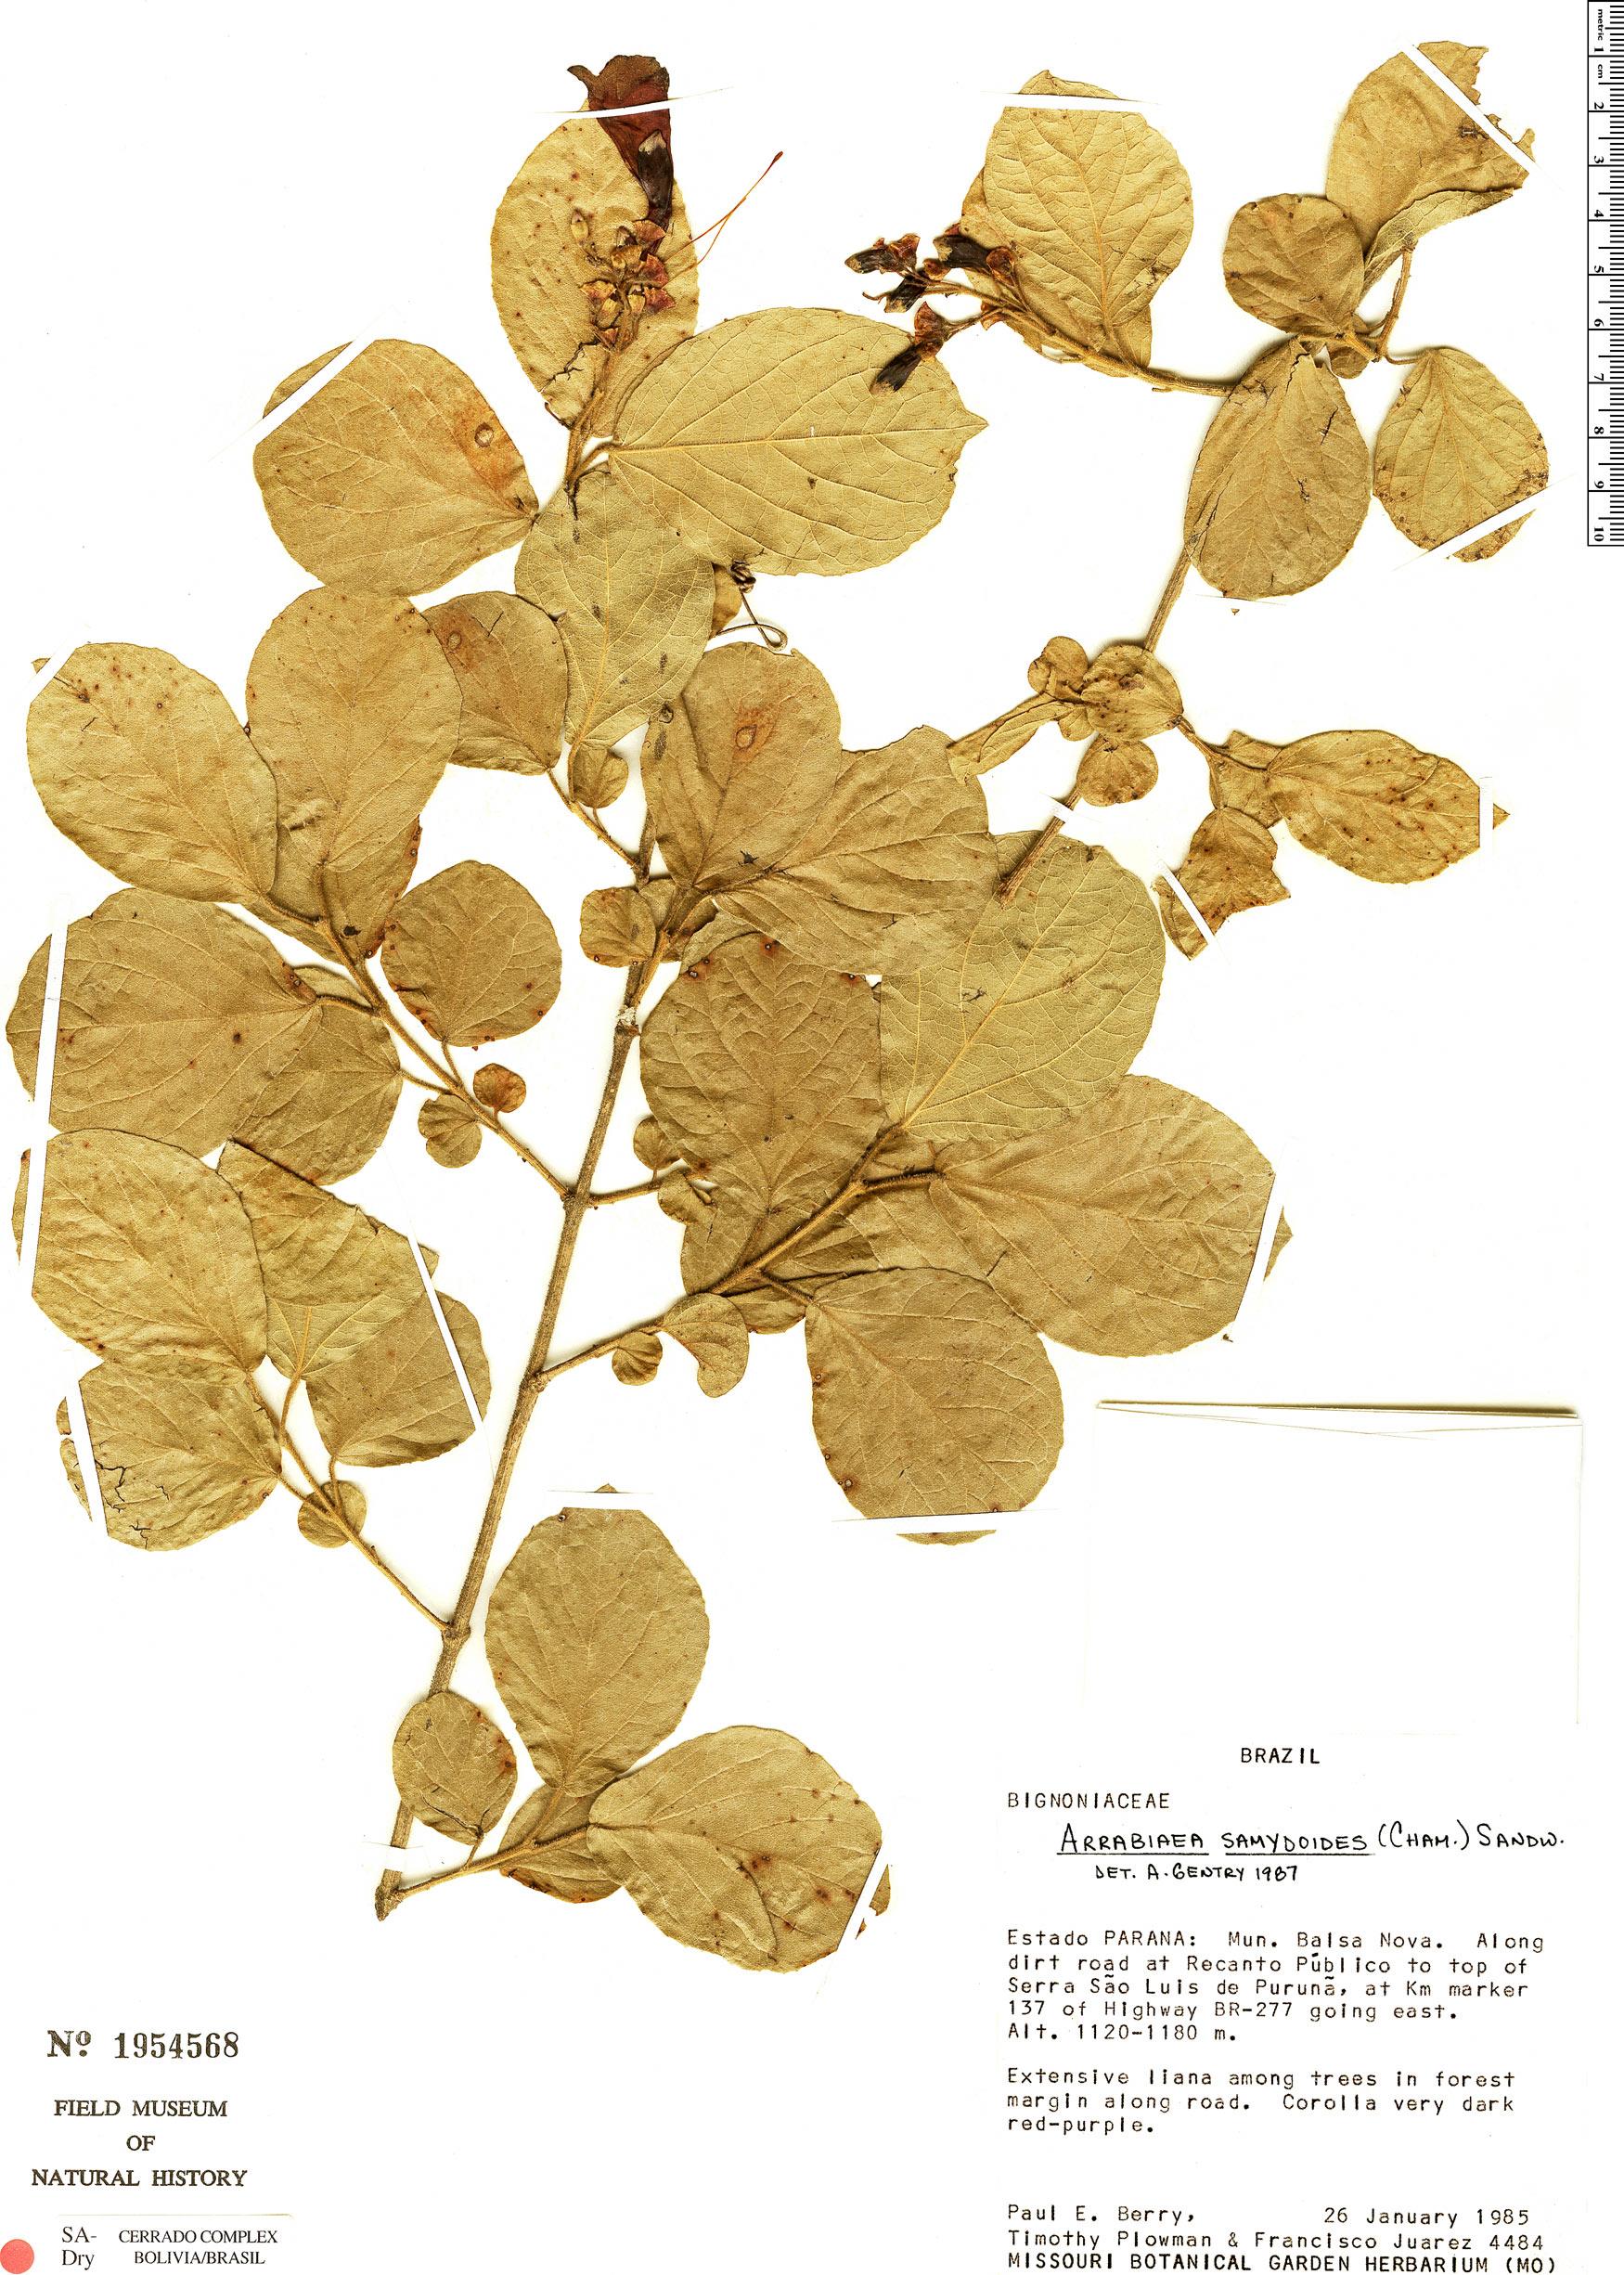 Specimen: Fridericia samydoides